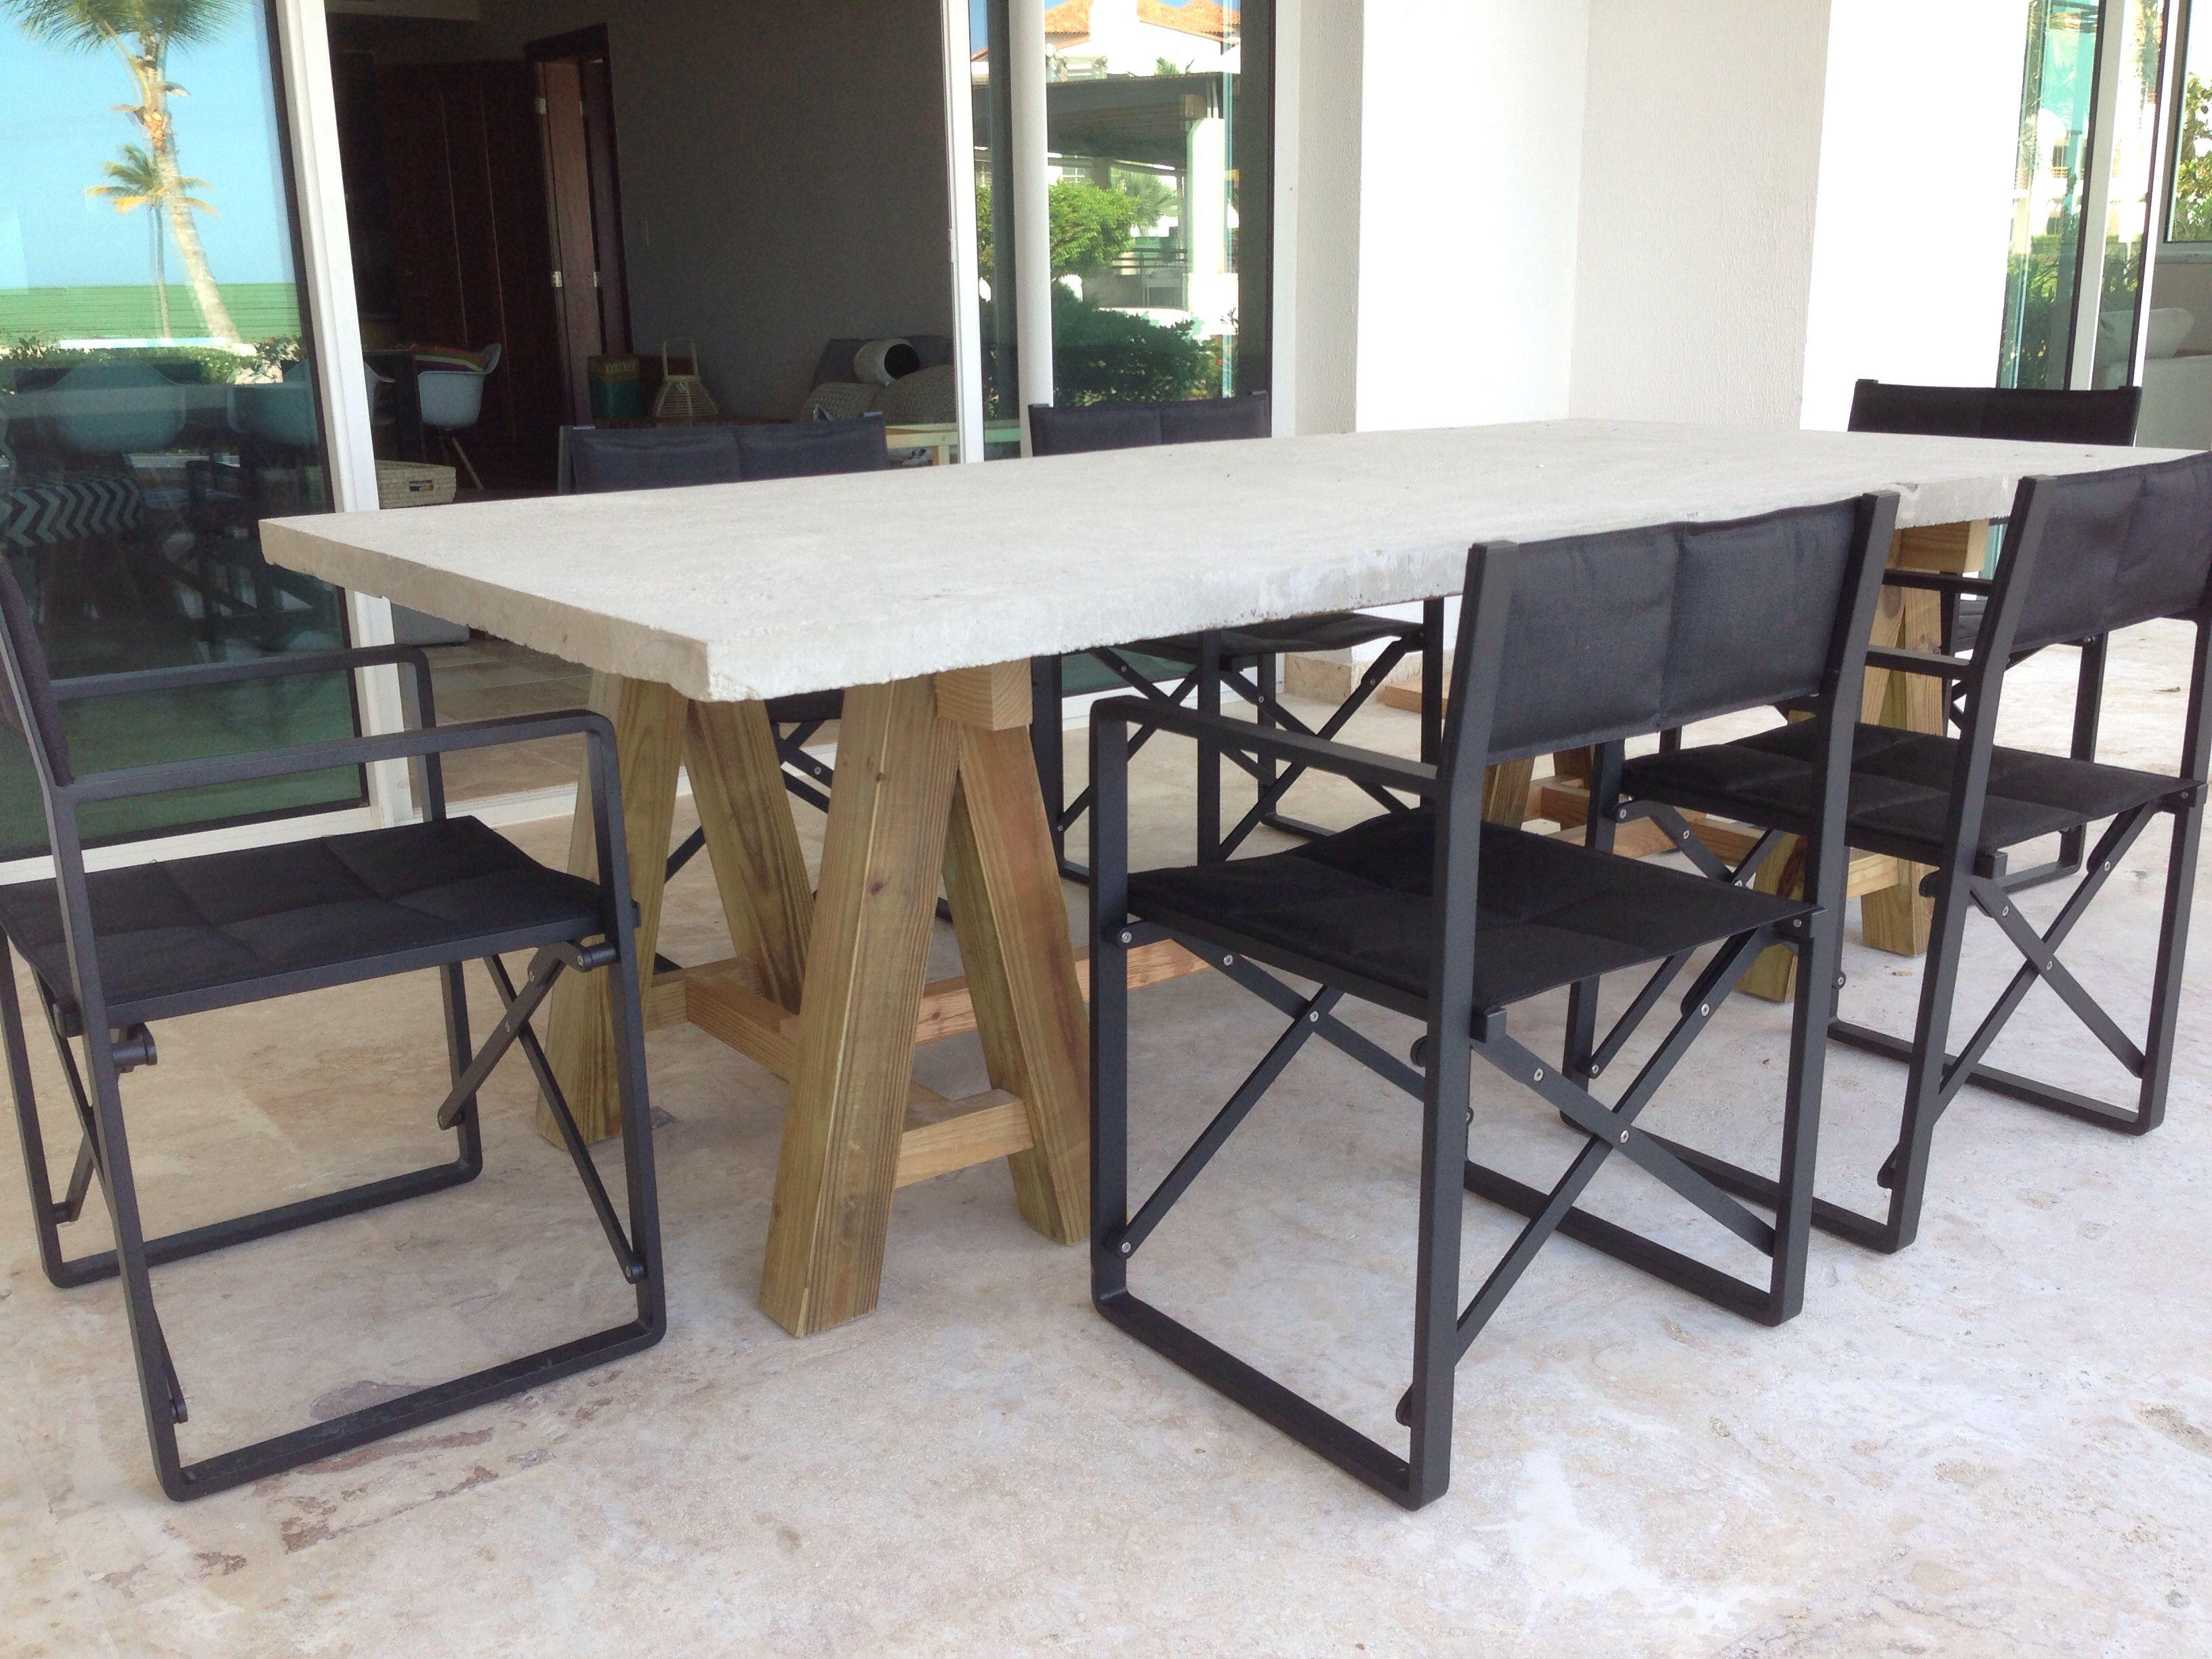 Mesas terraza madera almohadones grandes mesa de madera - Mesa para terraza ...